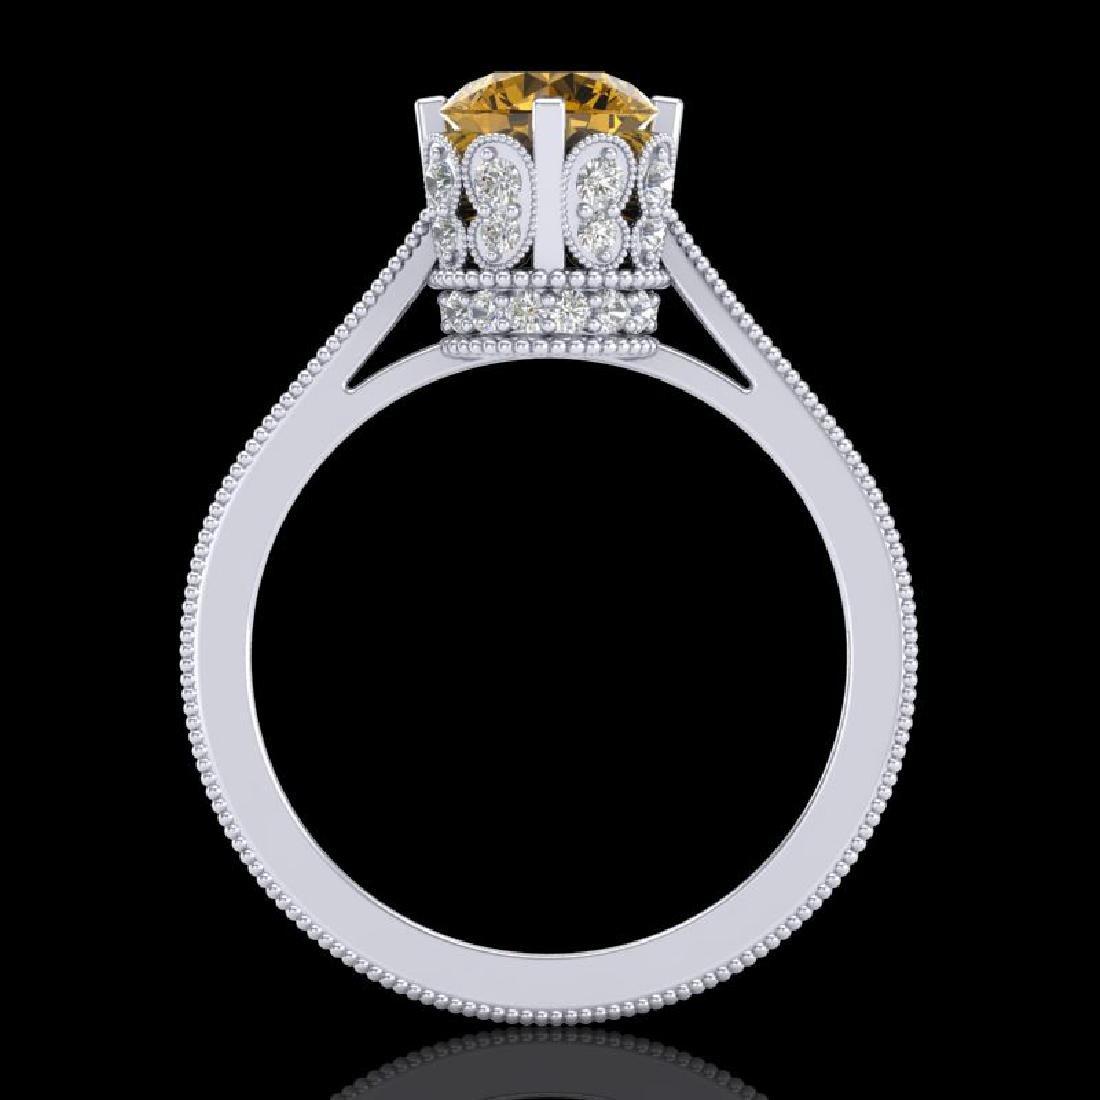 1.5 CTW Intense Fancy Yellow Diamond Engagement Art - 3